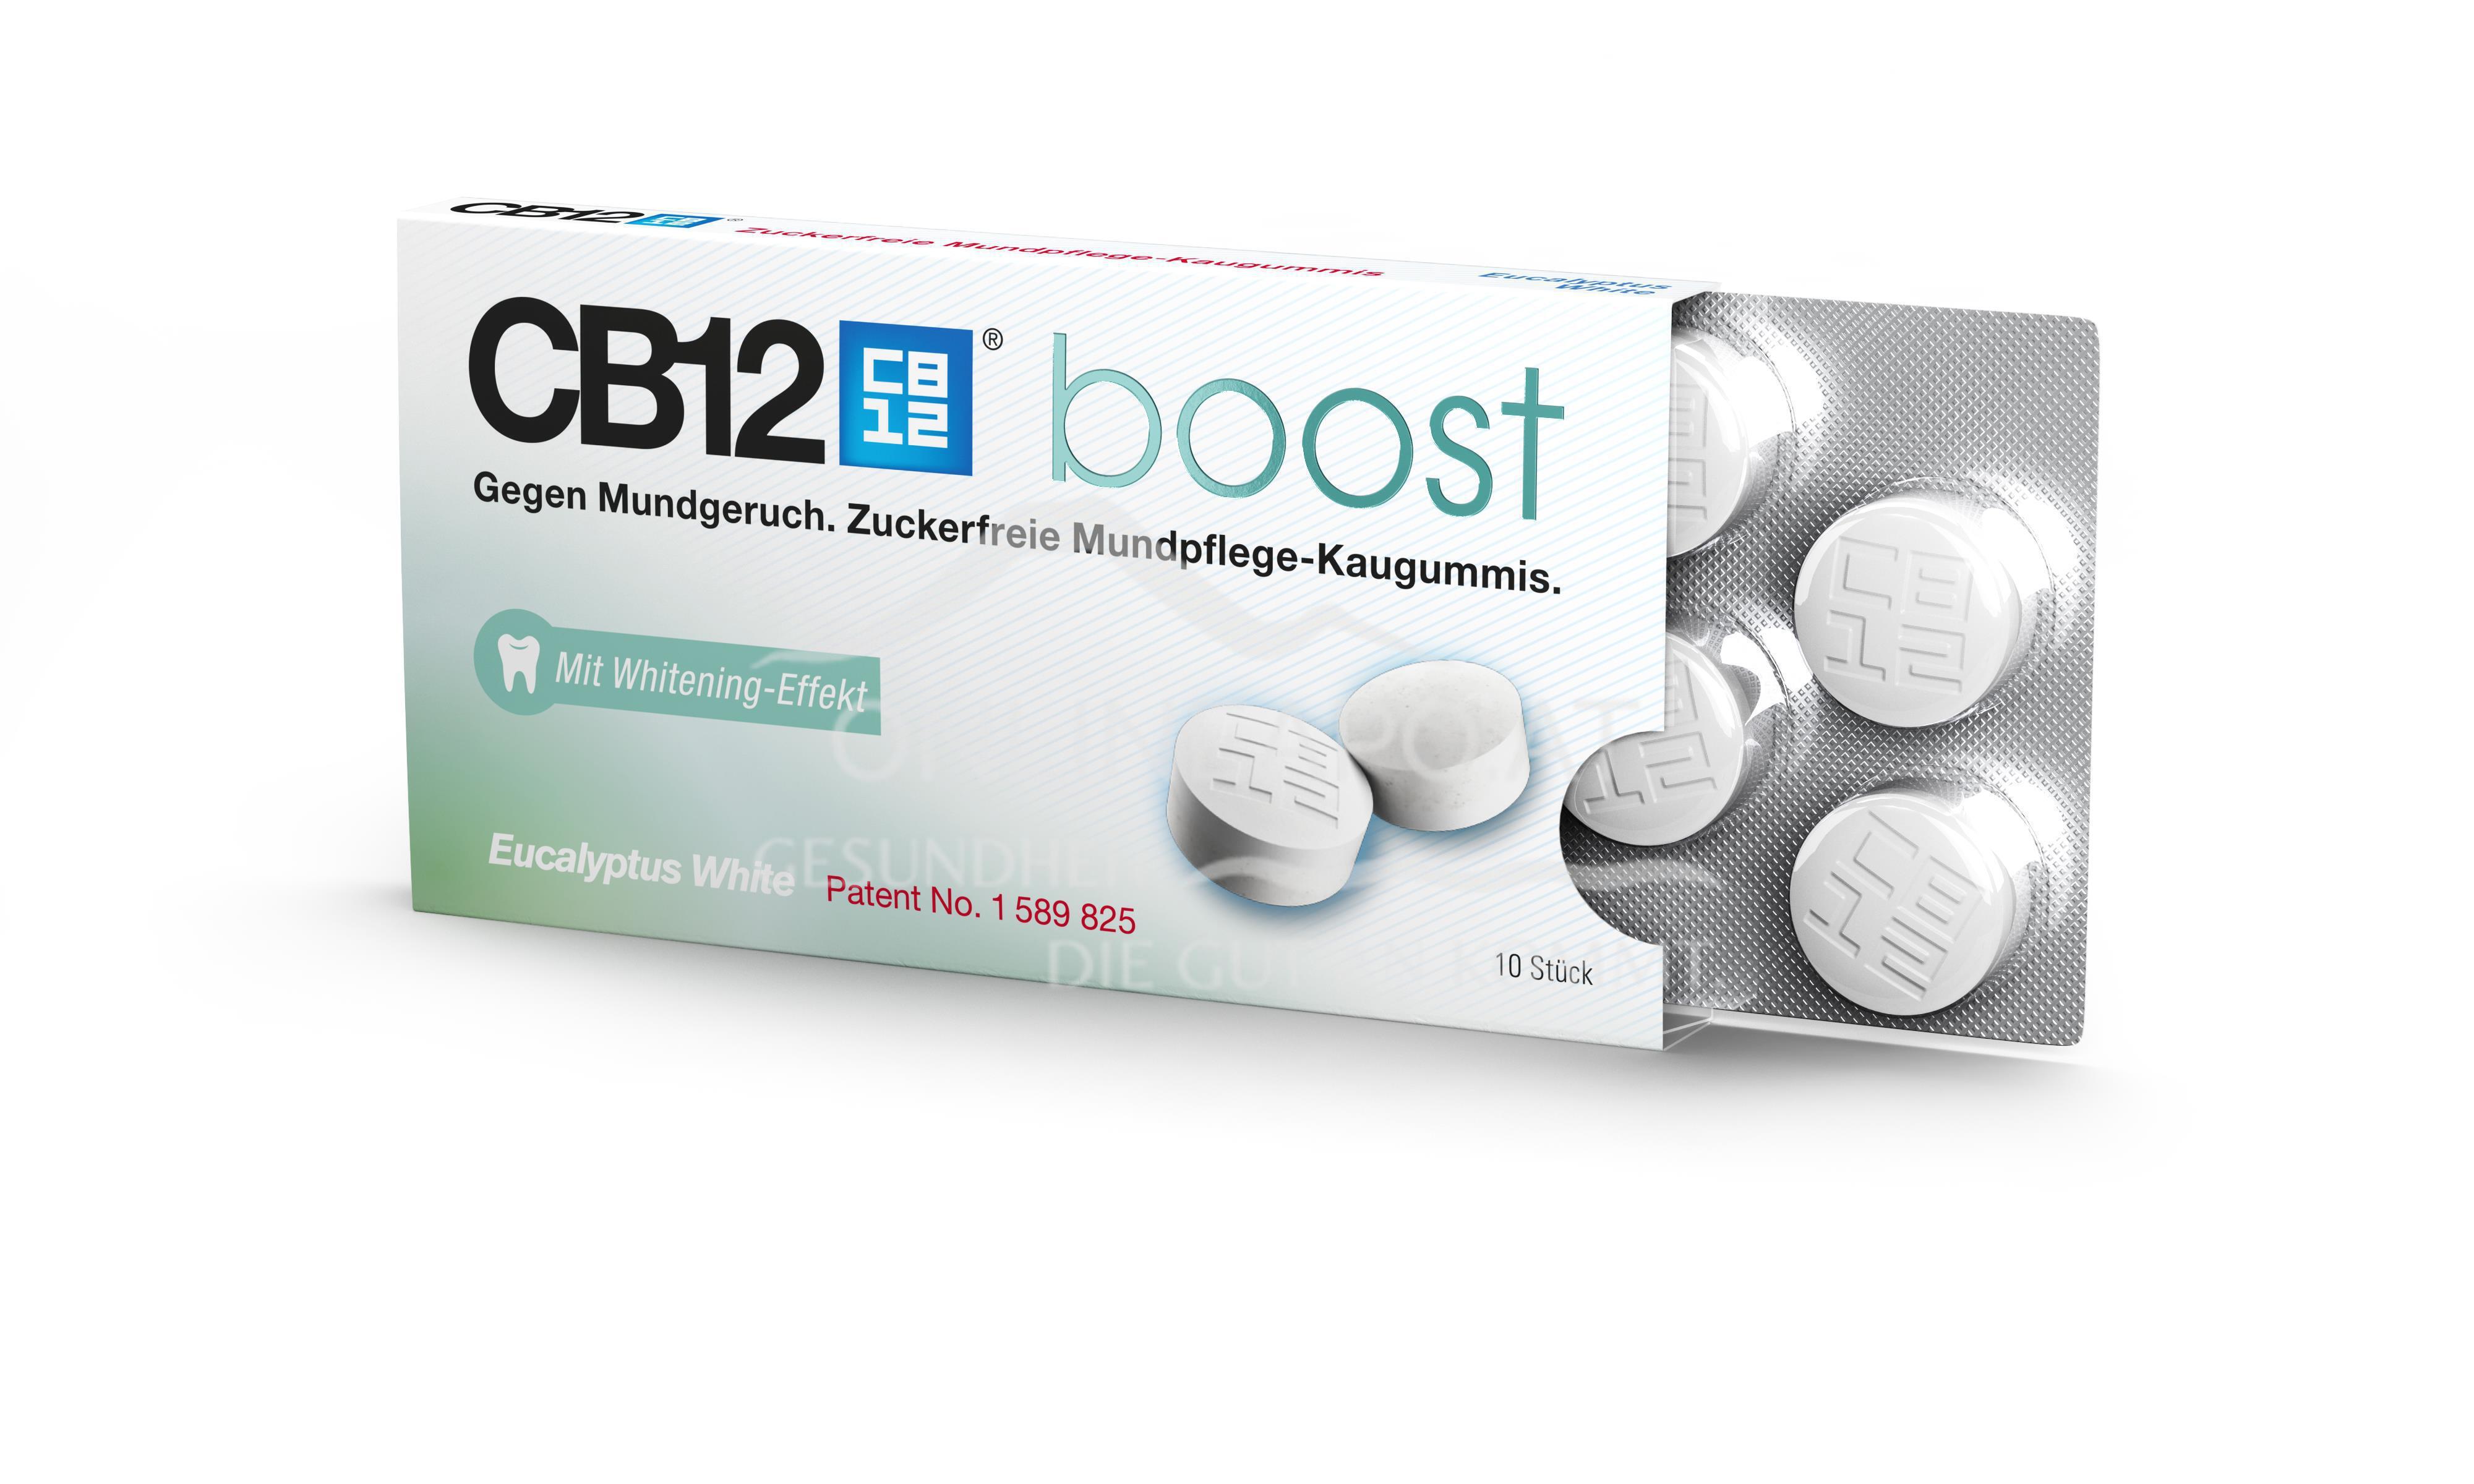 CB12 Boost Eukalyptus White